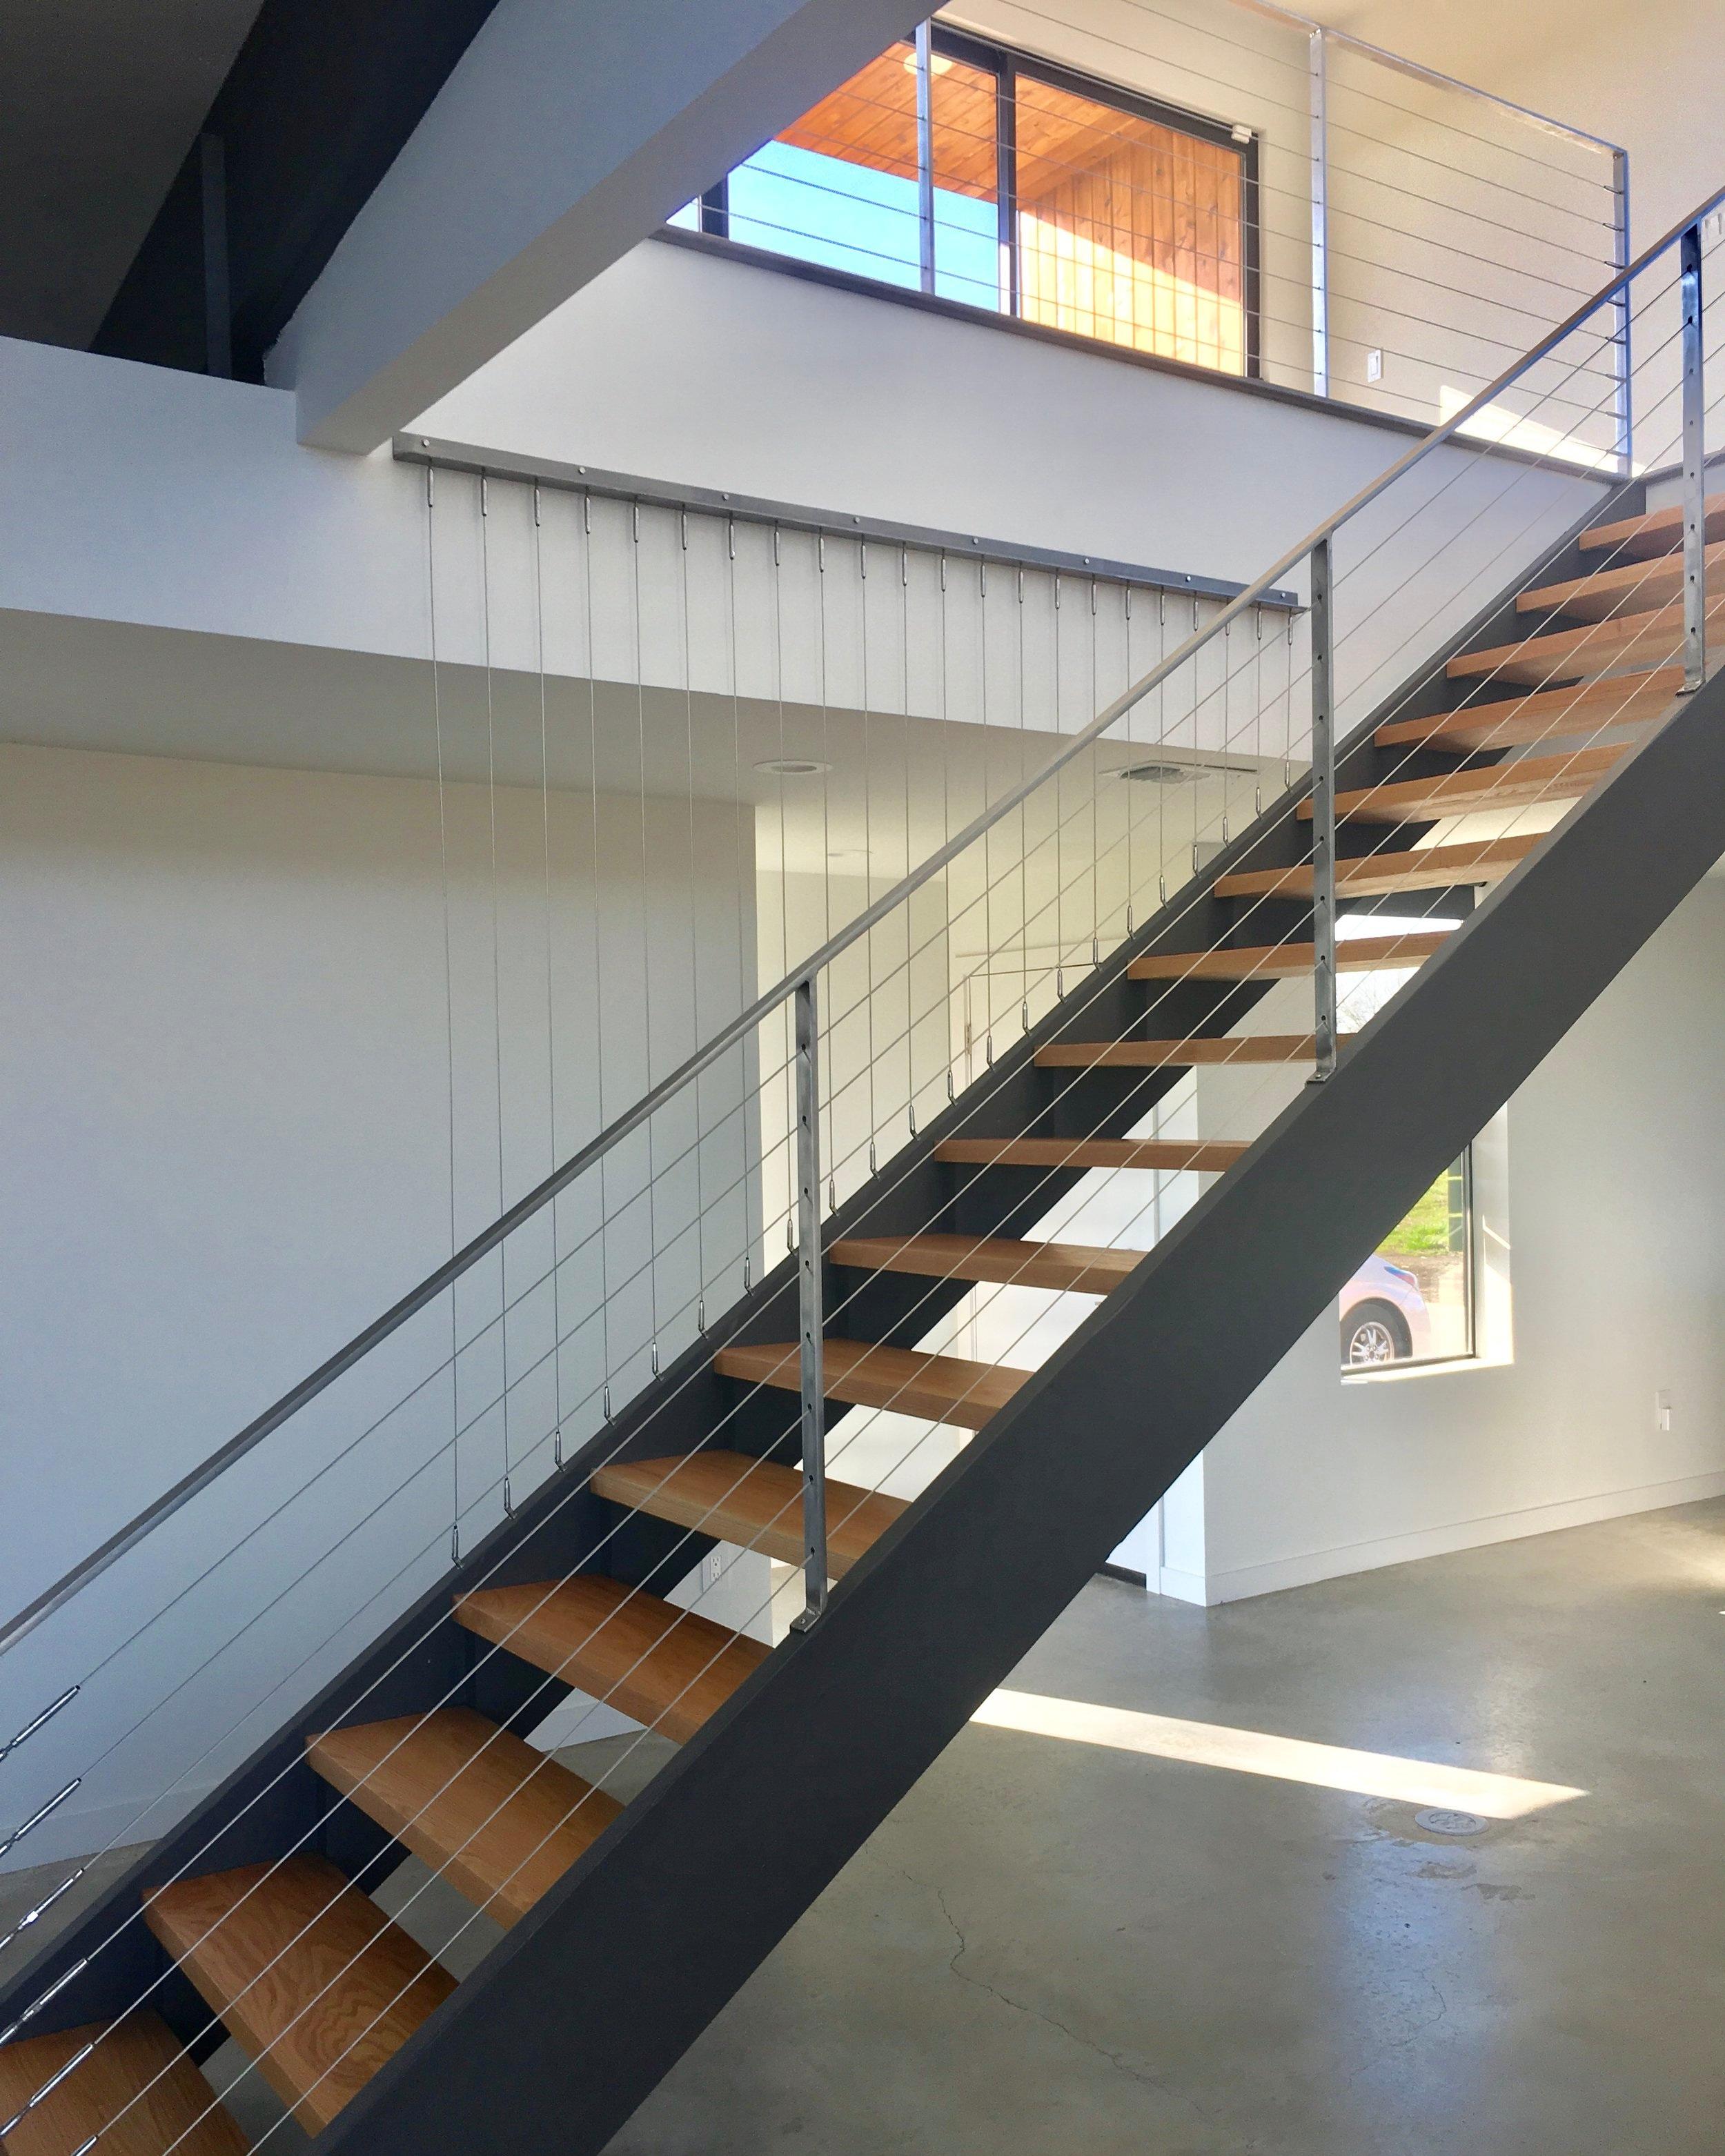 sherman_stairs.jpg